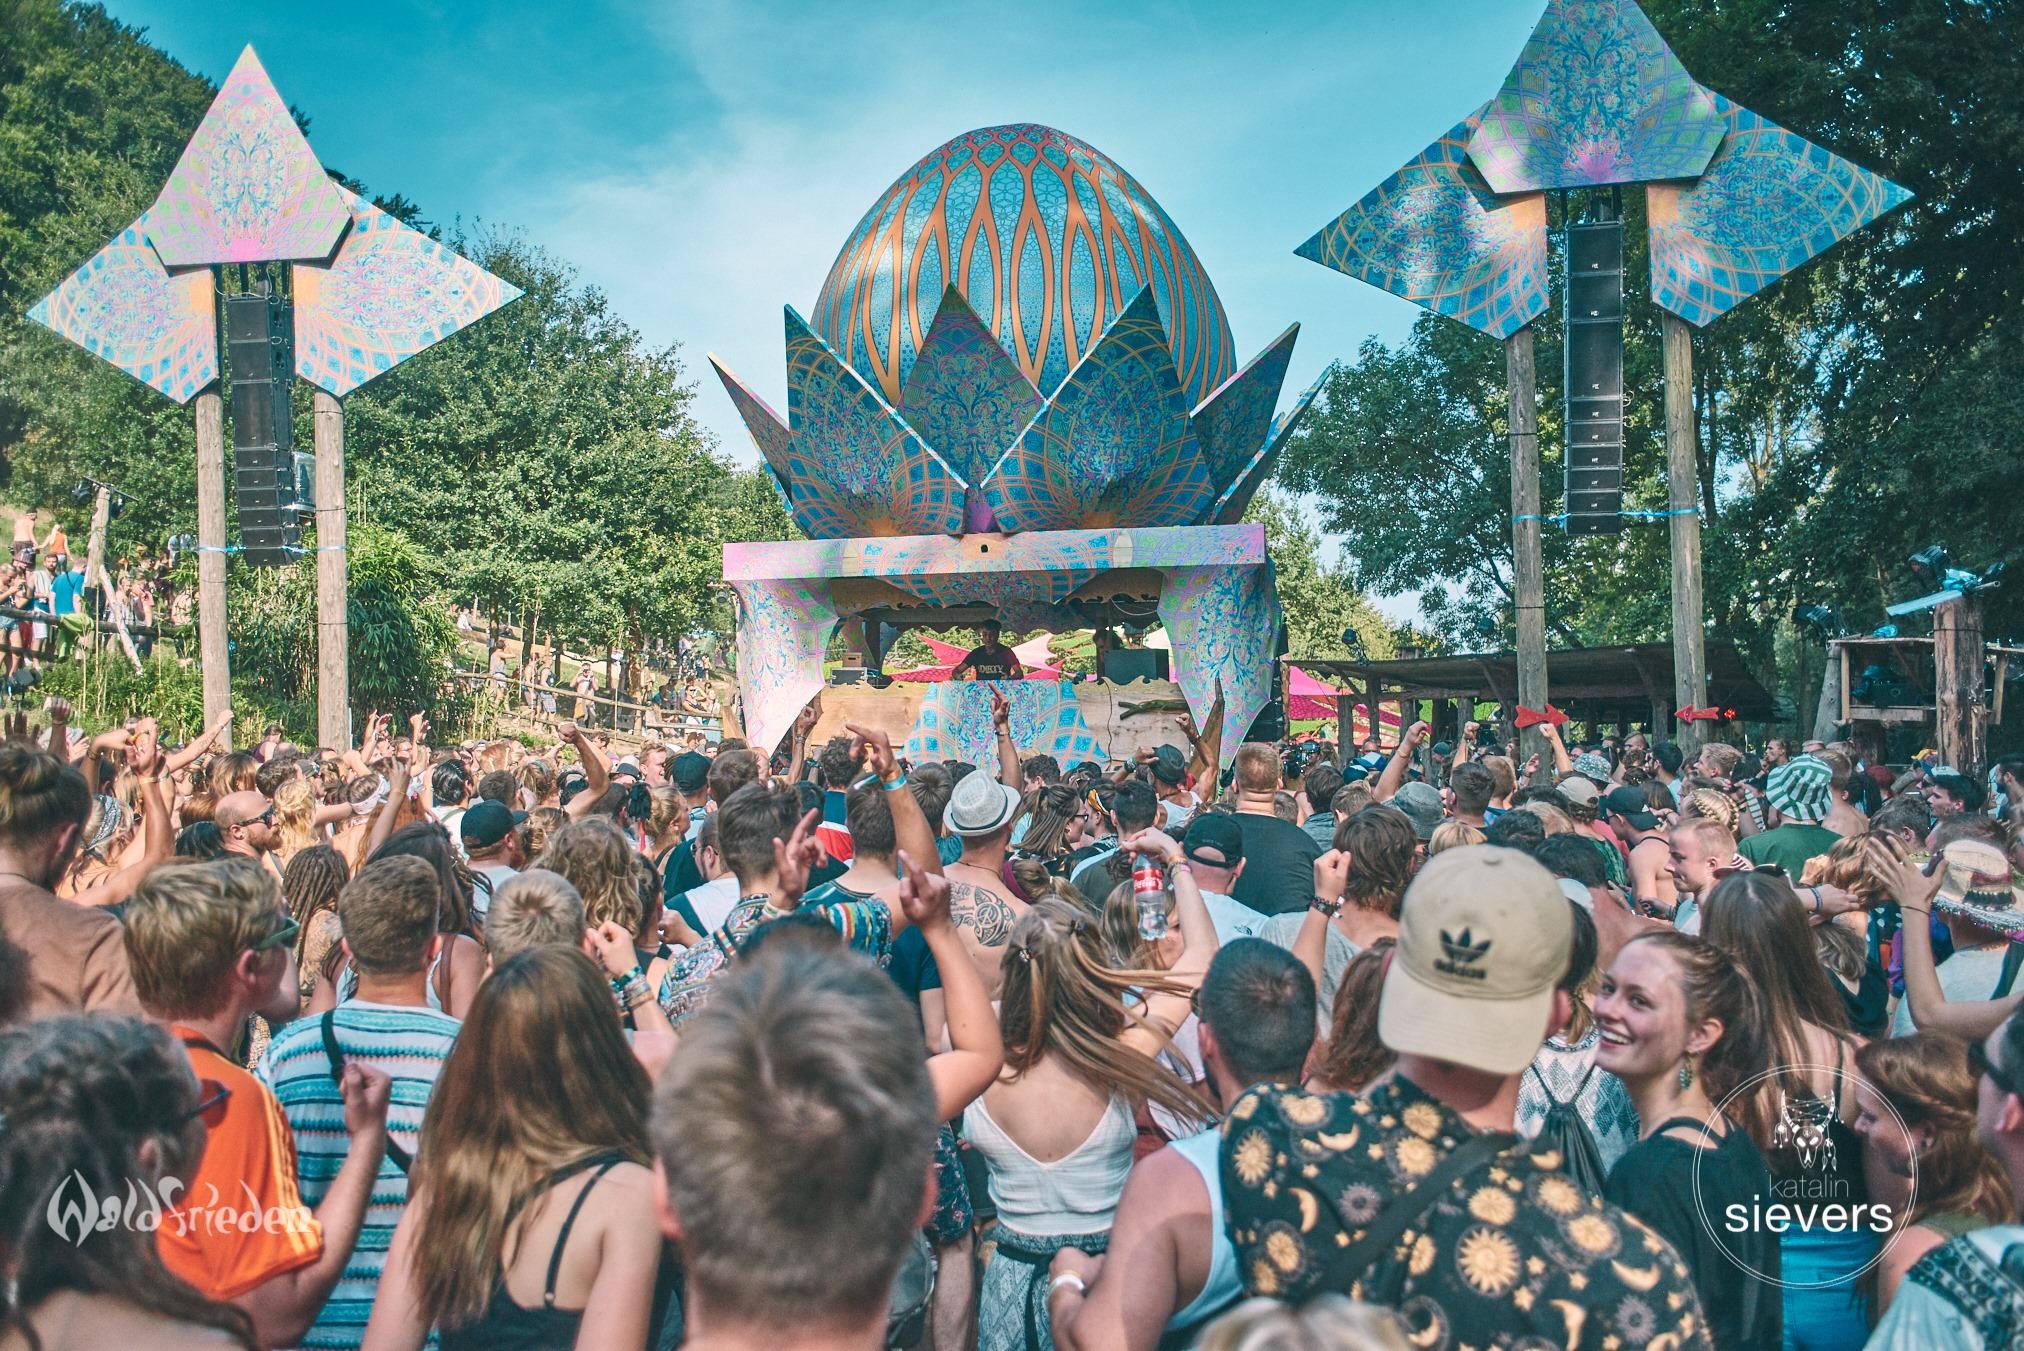 Waldfrieden Wonderland 2019 – Psytrance-Festival an einem Ort des Friedens